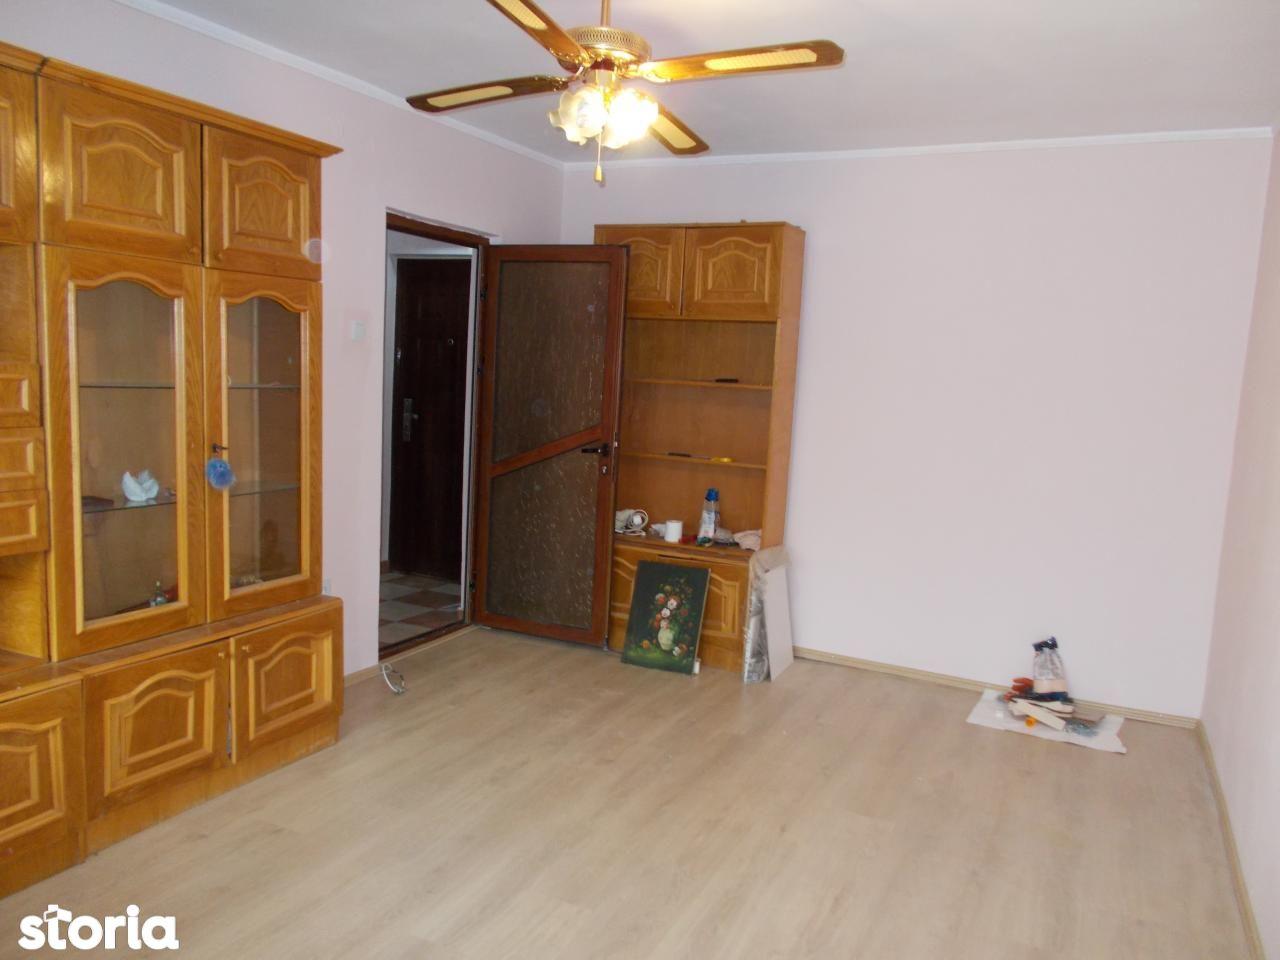 Apartament de vanzare, Braila, Viziru 3 - Foto 9